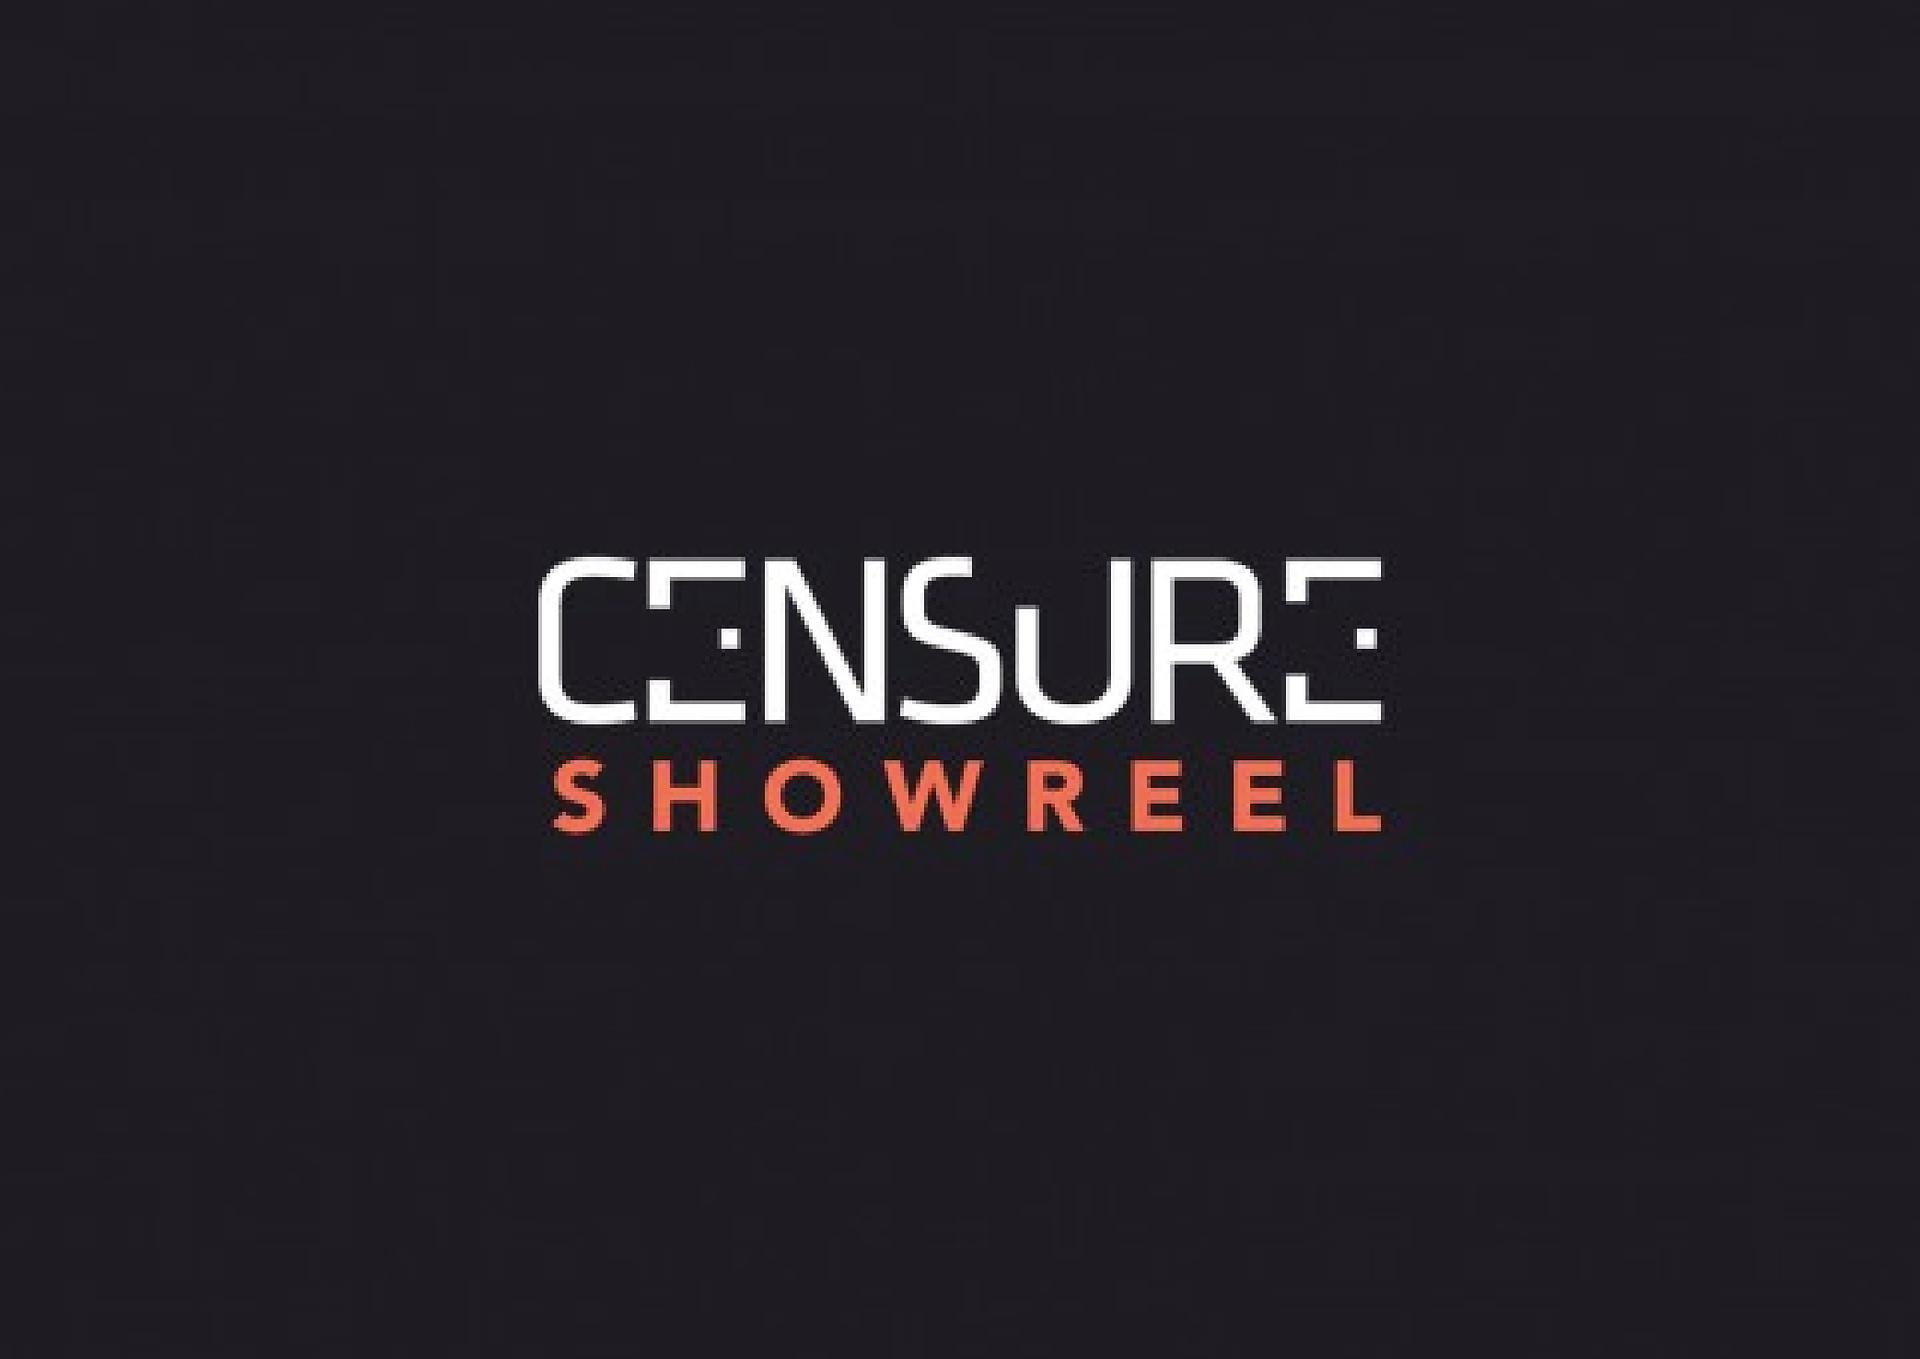 CENSURE showreel 2017